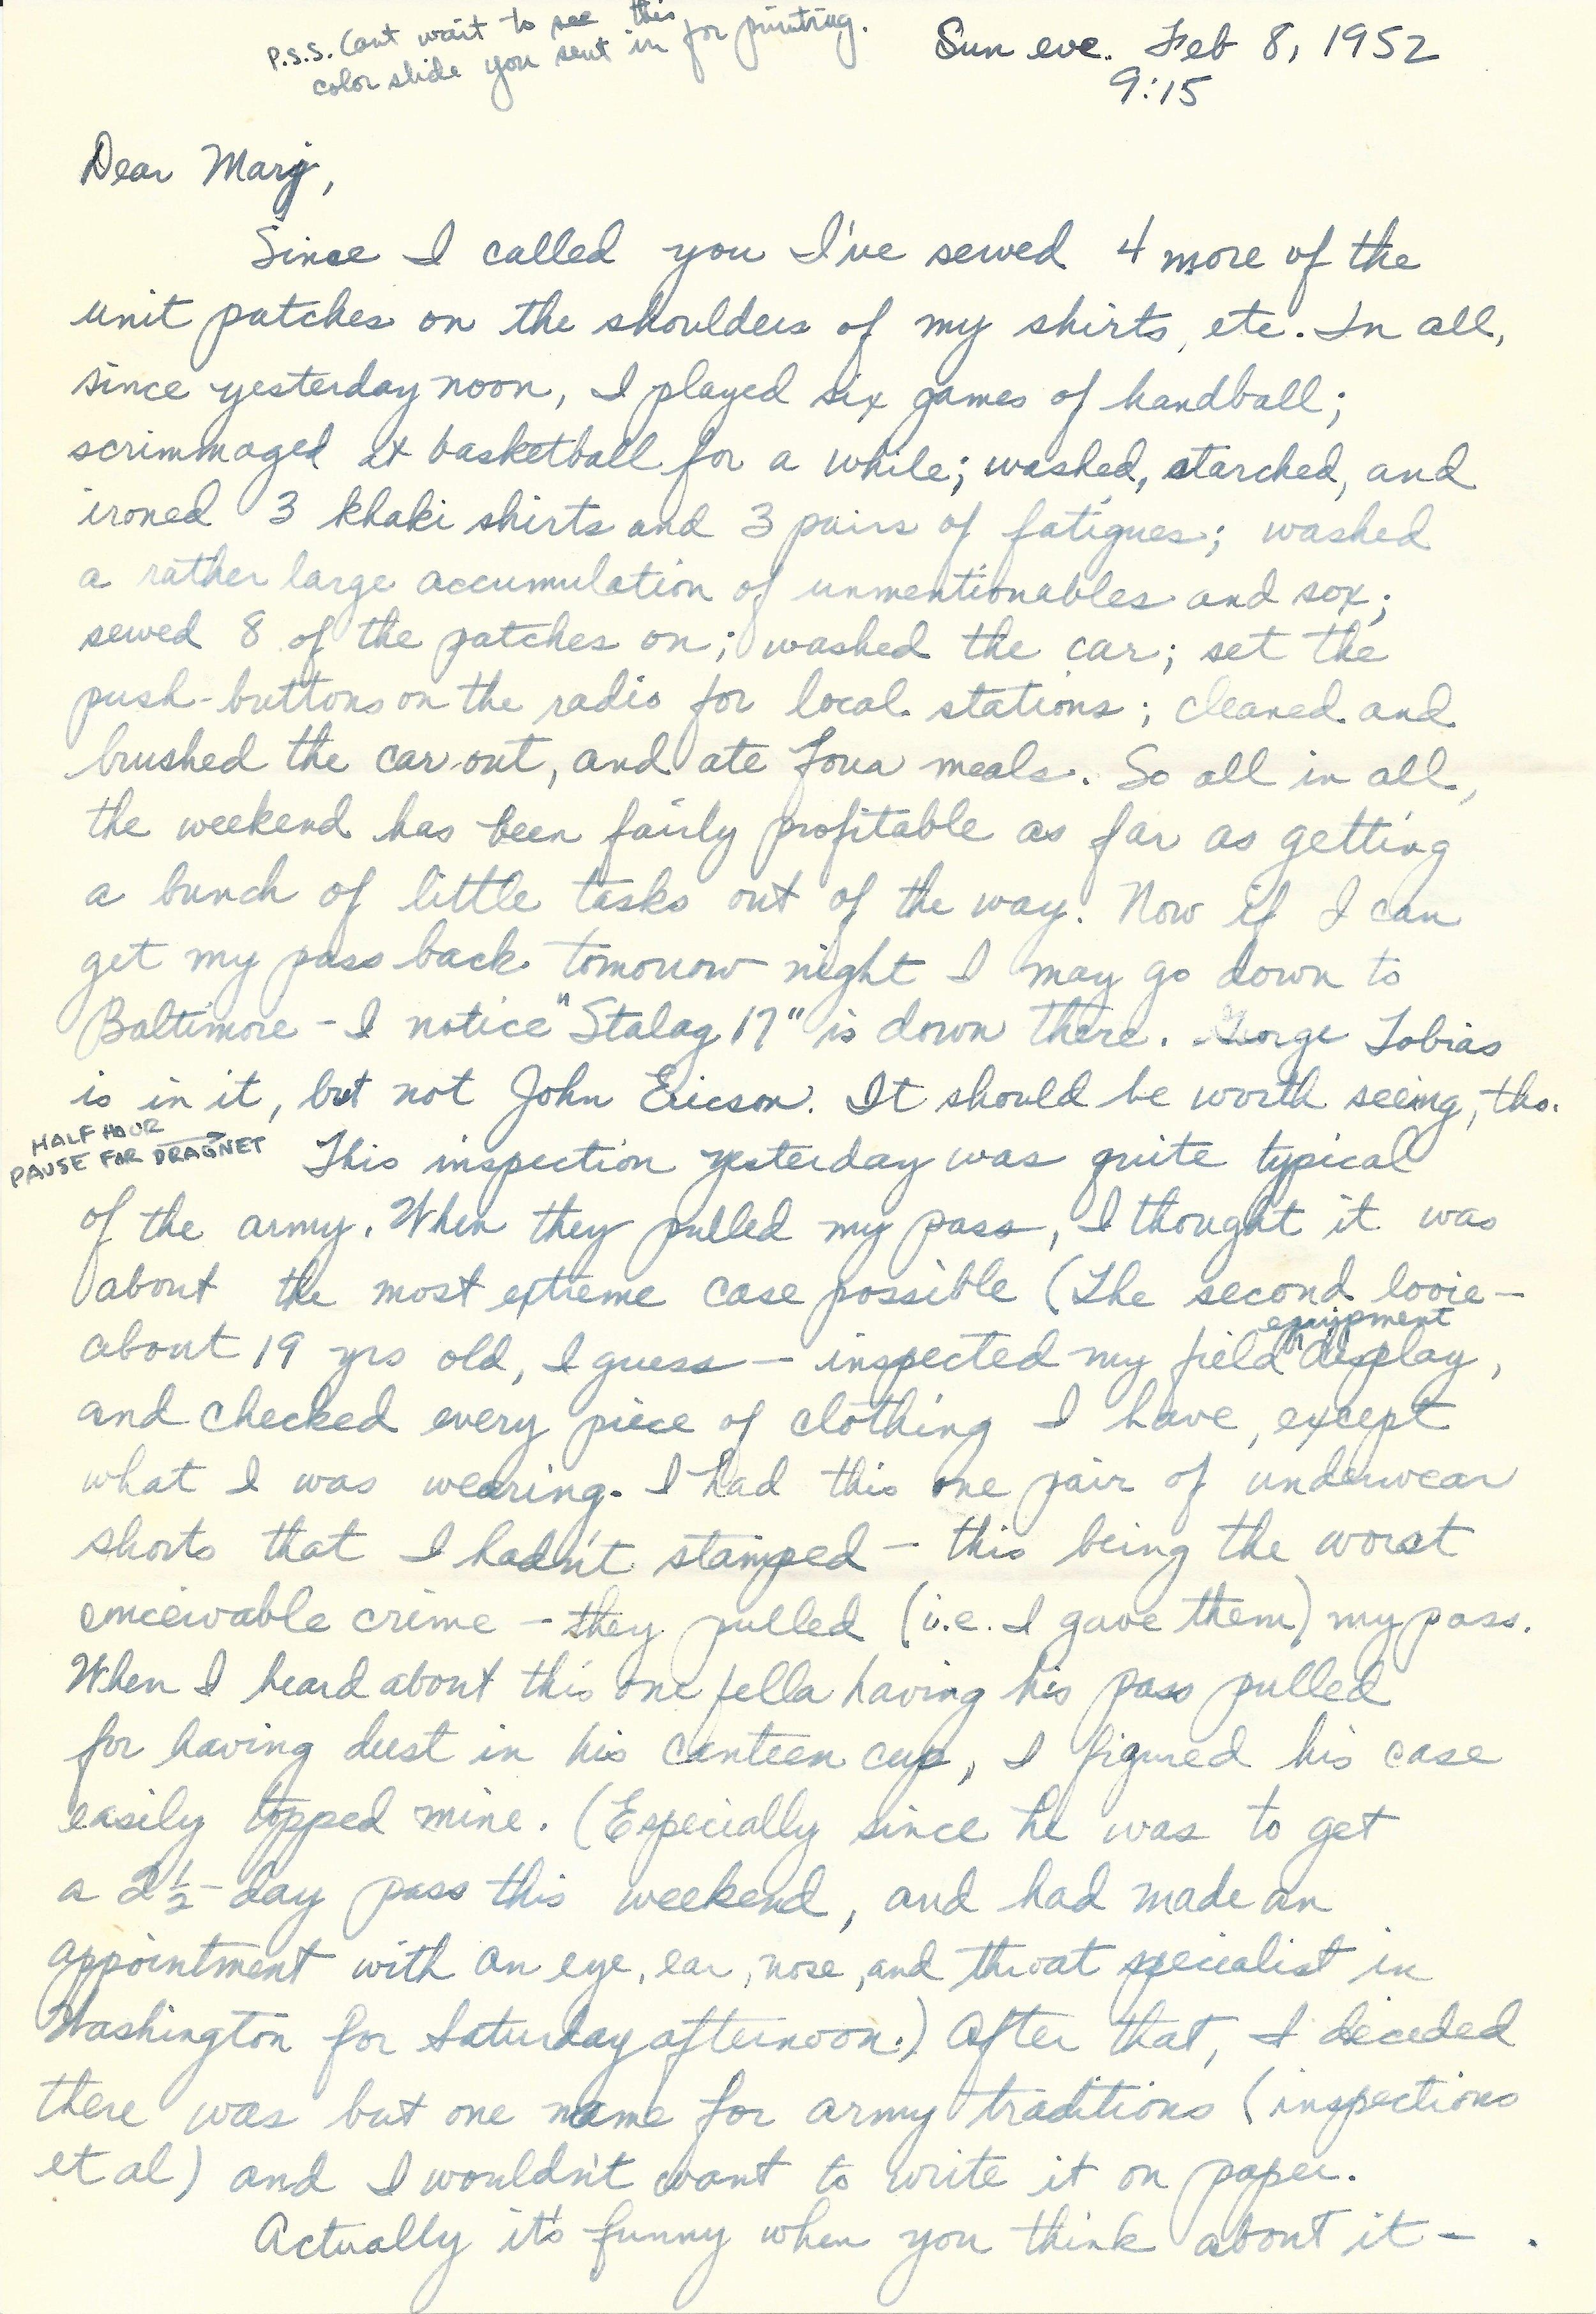 6. Feb. 8, 1953 (Opa)_Page_3.jpg